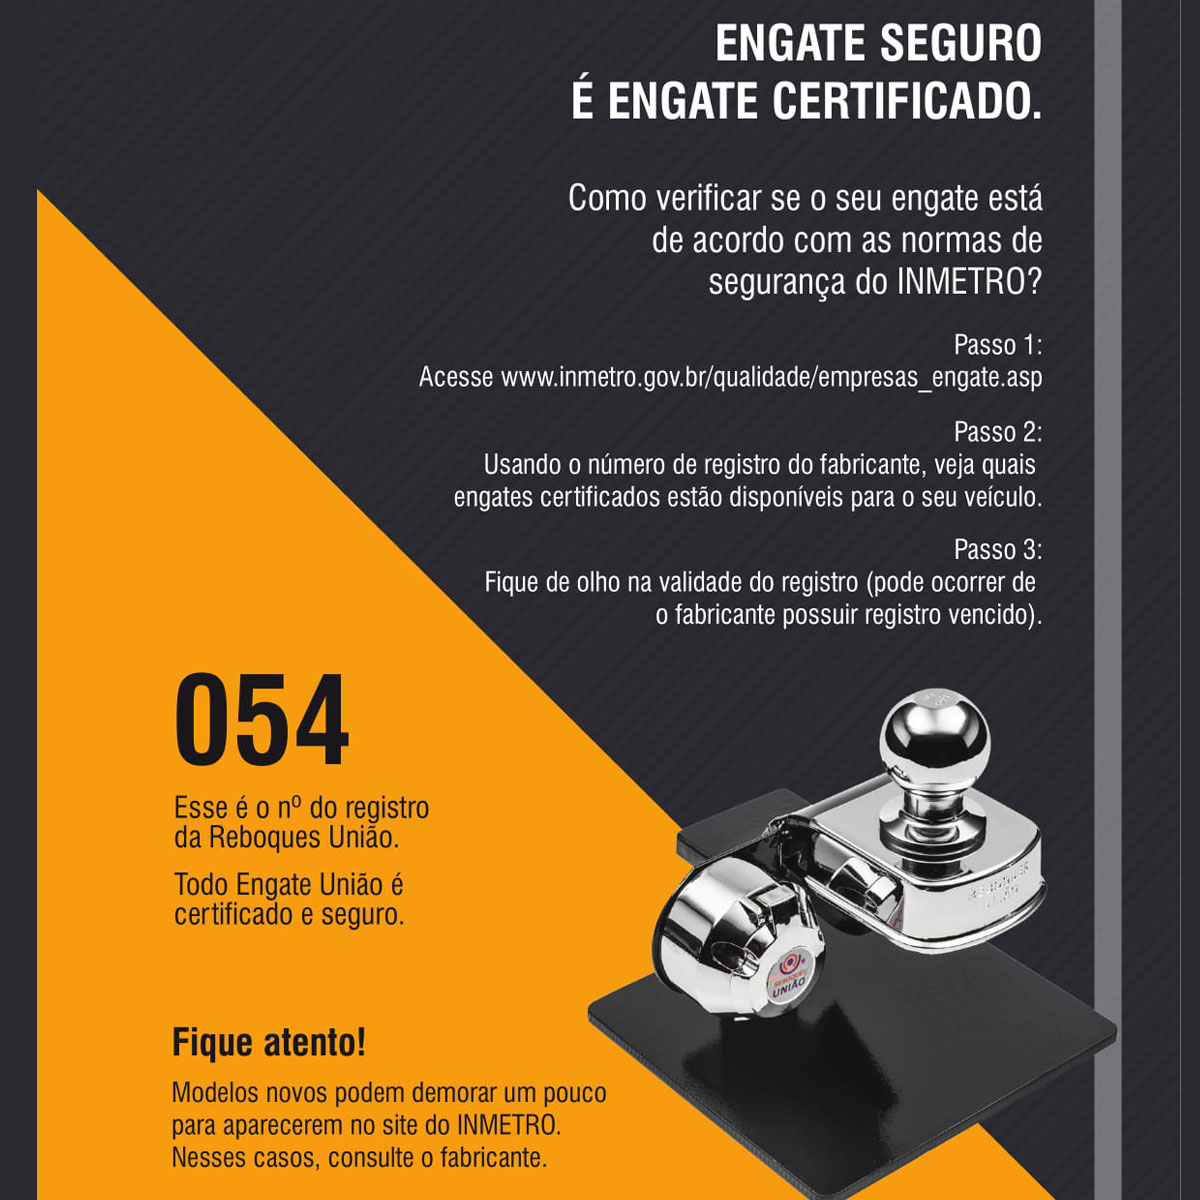 ENGATE DE REBOQUE JEEP RENEGADE 4X4 DIESEL E TRAIL HAWK REBOQUES UNIÃO FIXO